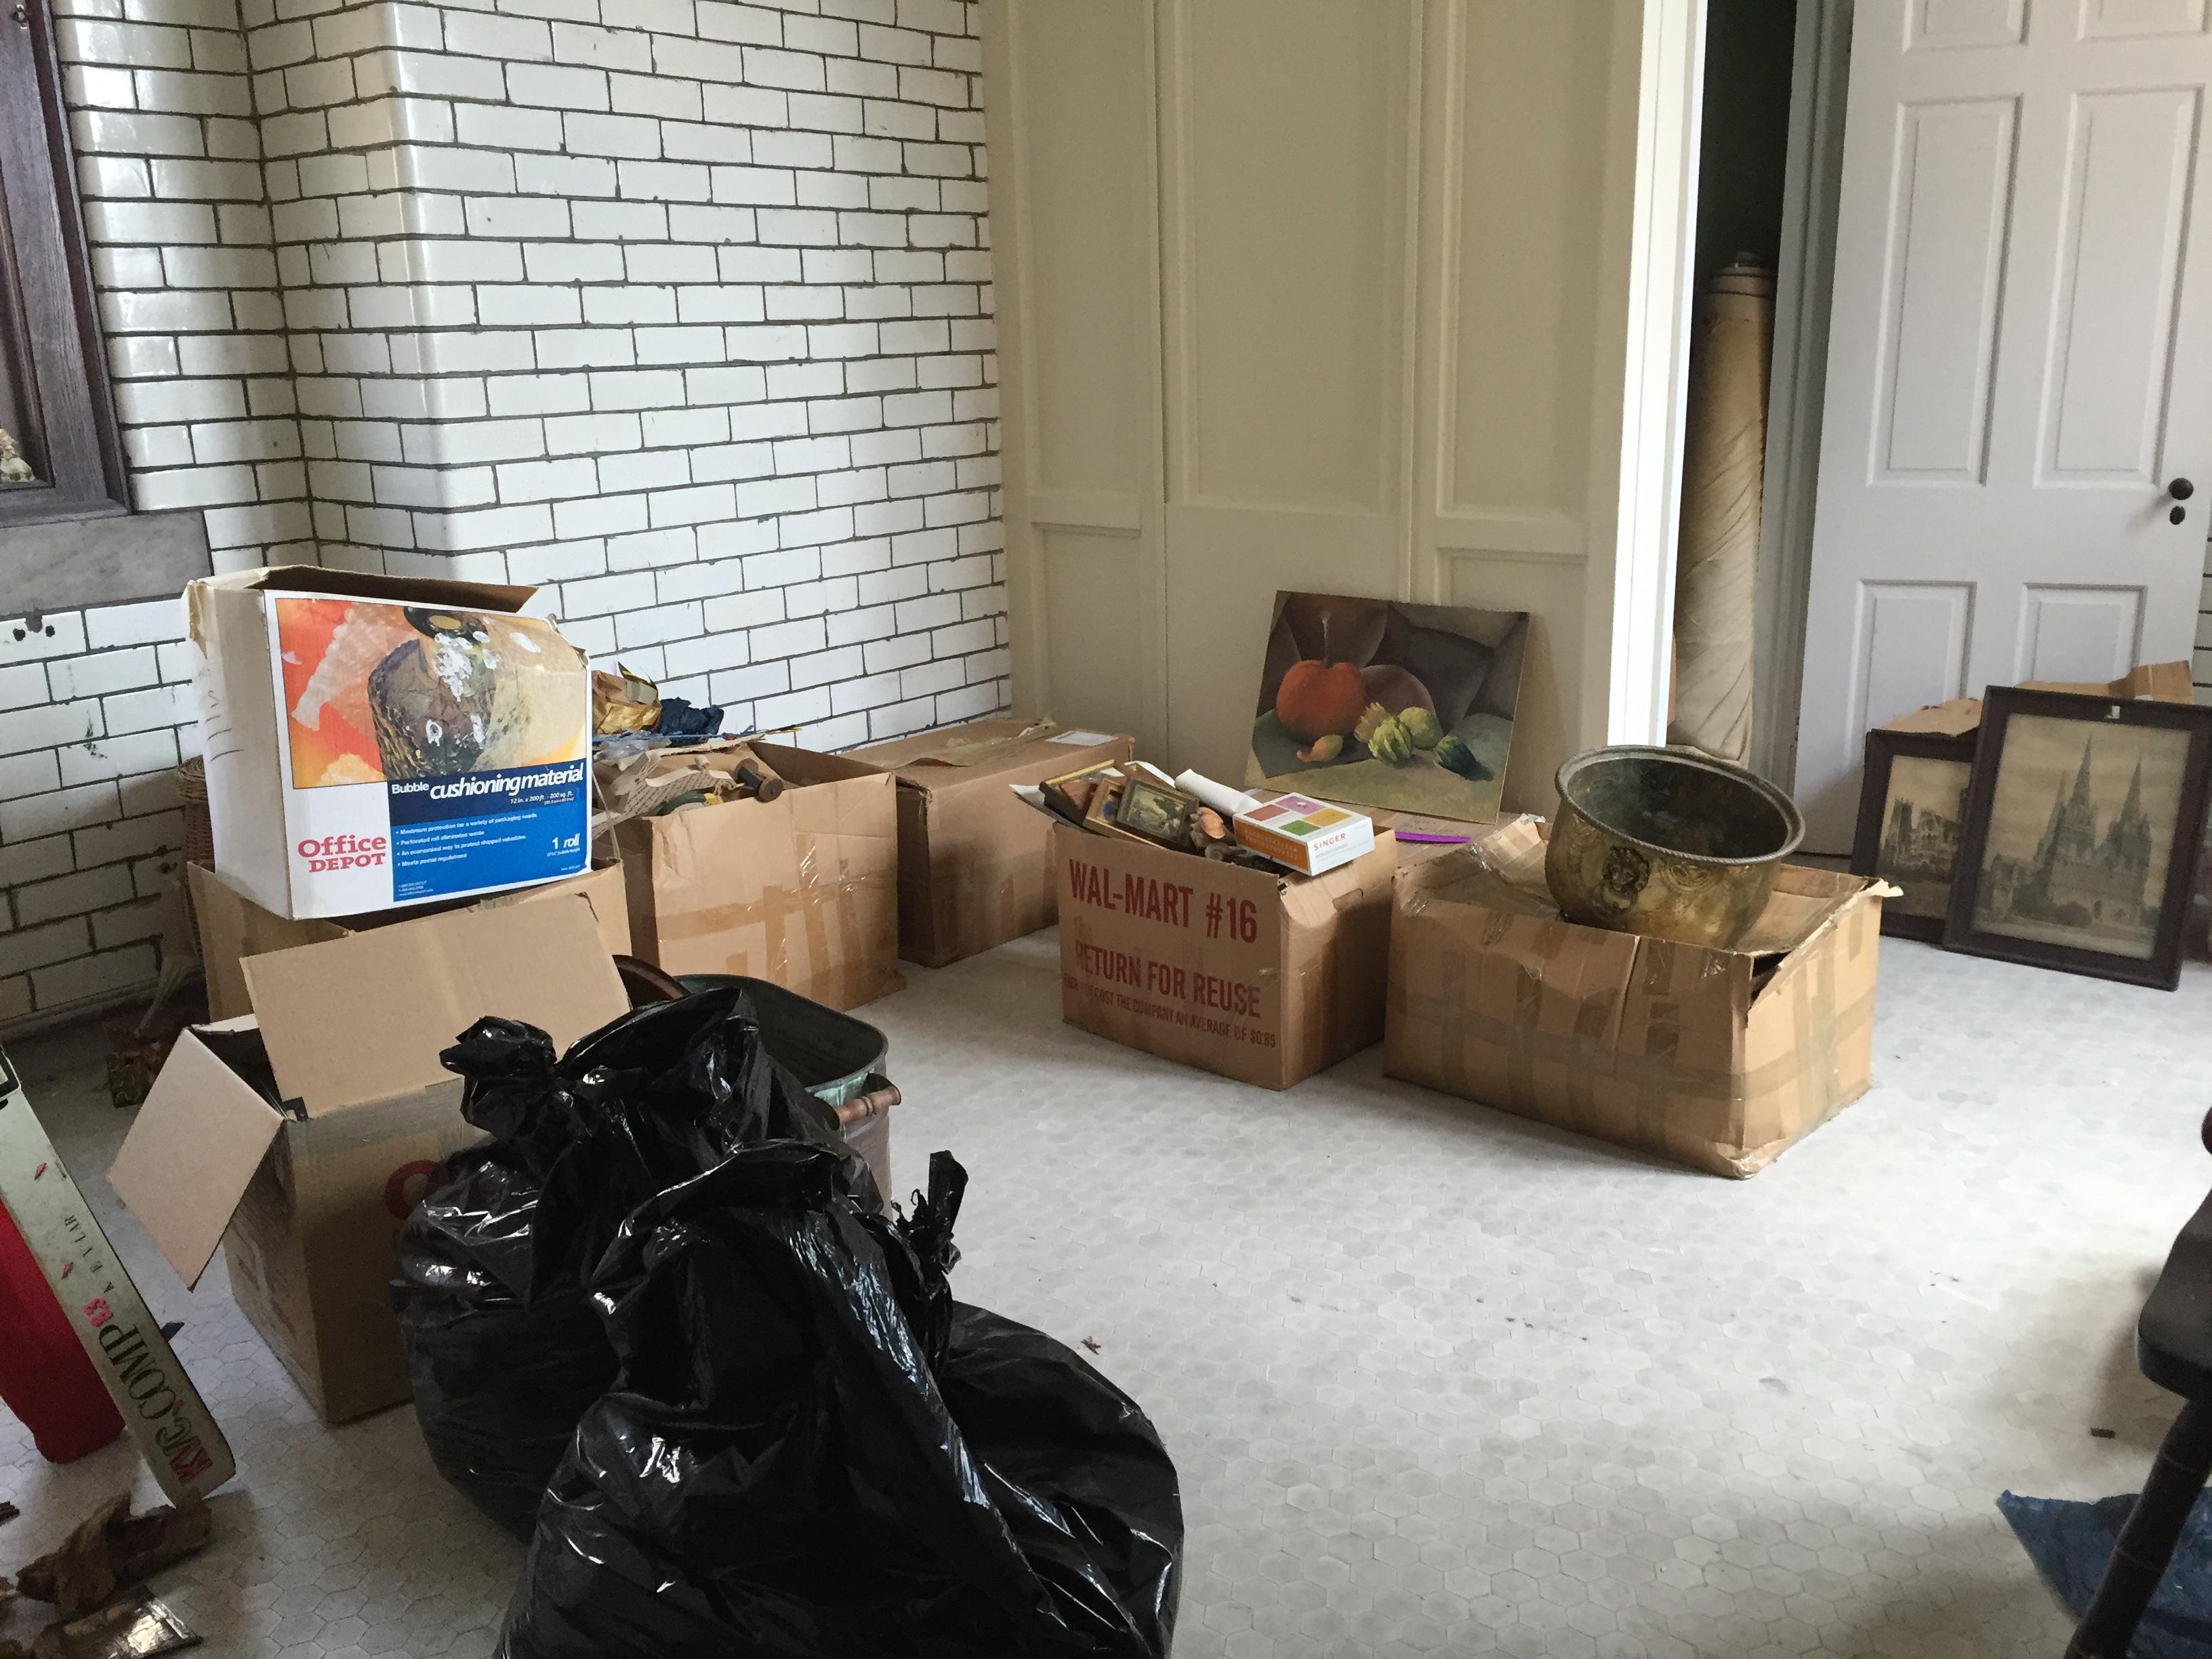 Before-Tiled Room